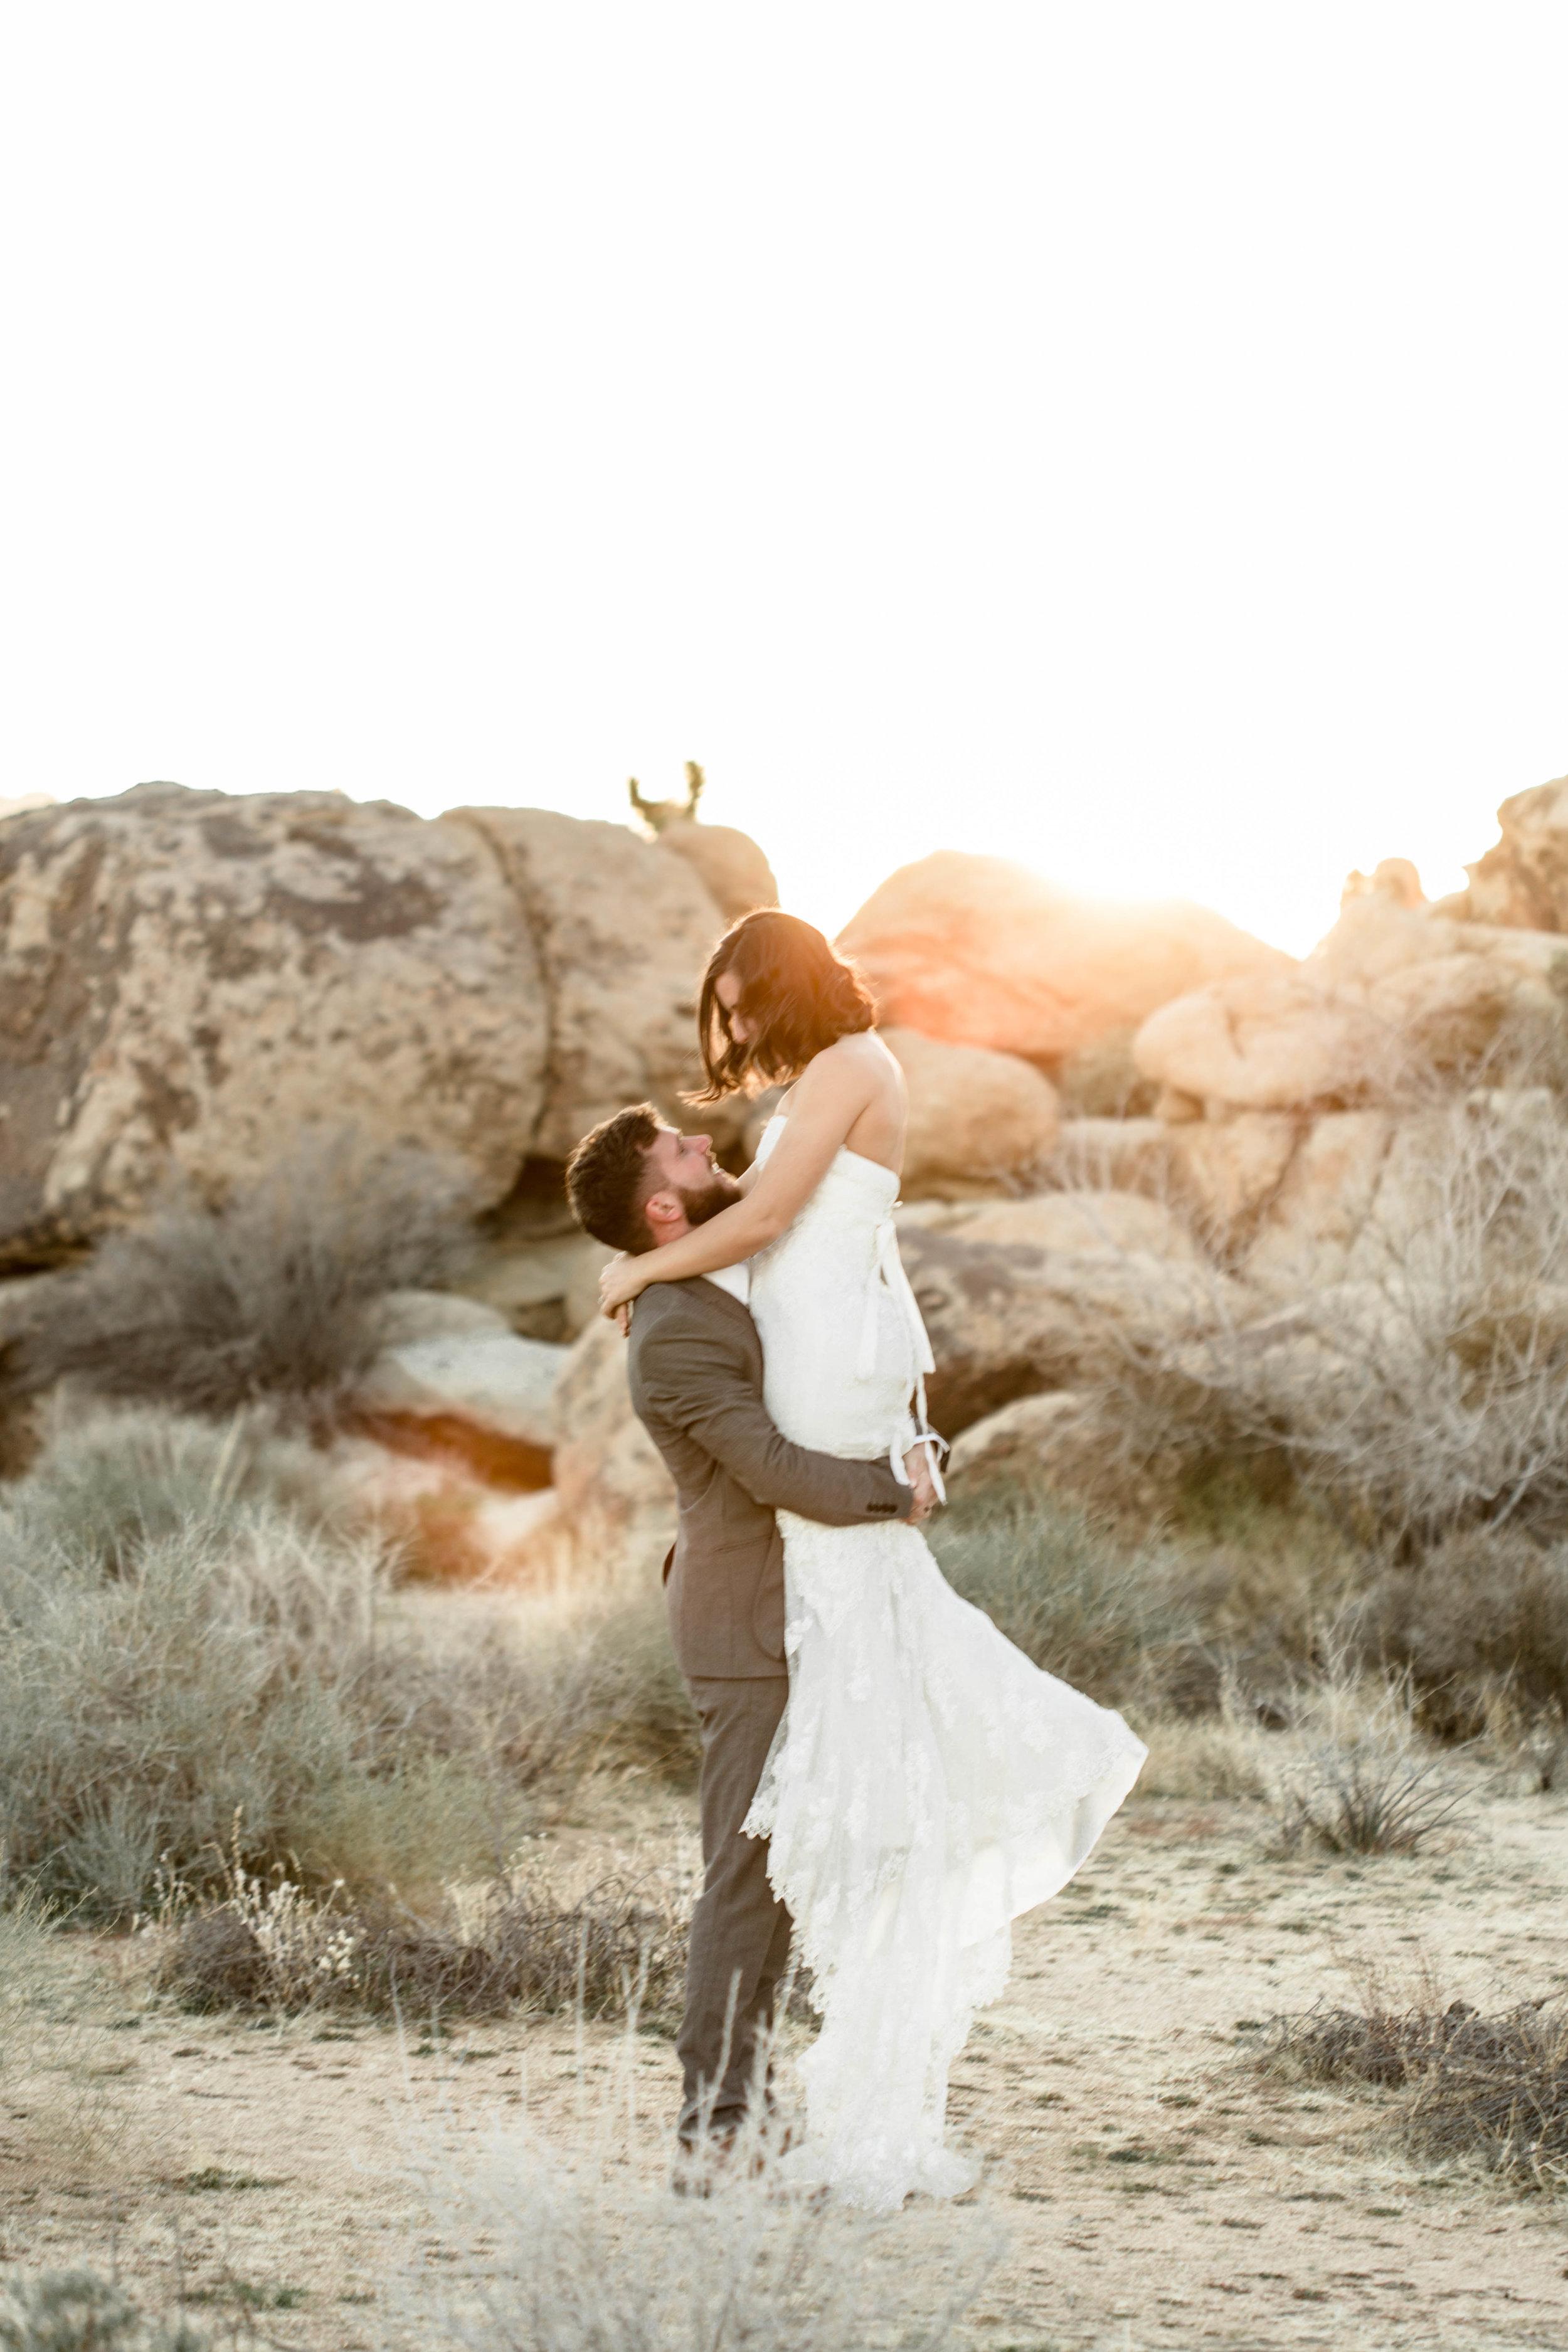 nicole-daacke-photography-joshua-tree-adventurous-elopement-wedding-national-park-wedding-photographer-adventure-wedding-adventurous-elopement-jtree-joshua-tree-national-park-wedding-photographer-intimate-weddings-golden-desert-love-23.jpg